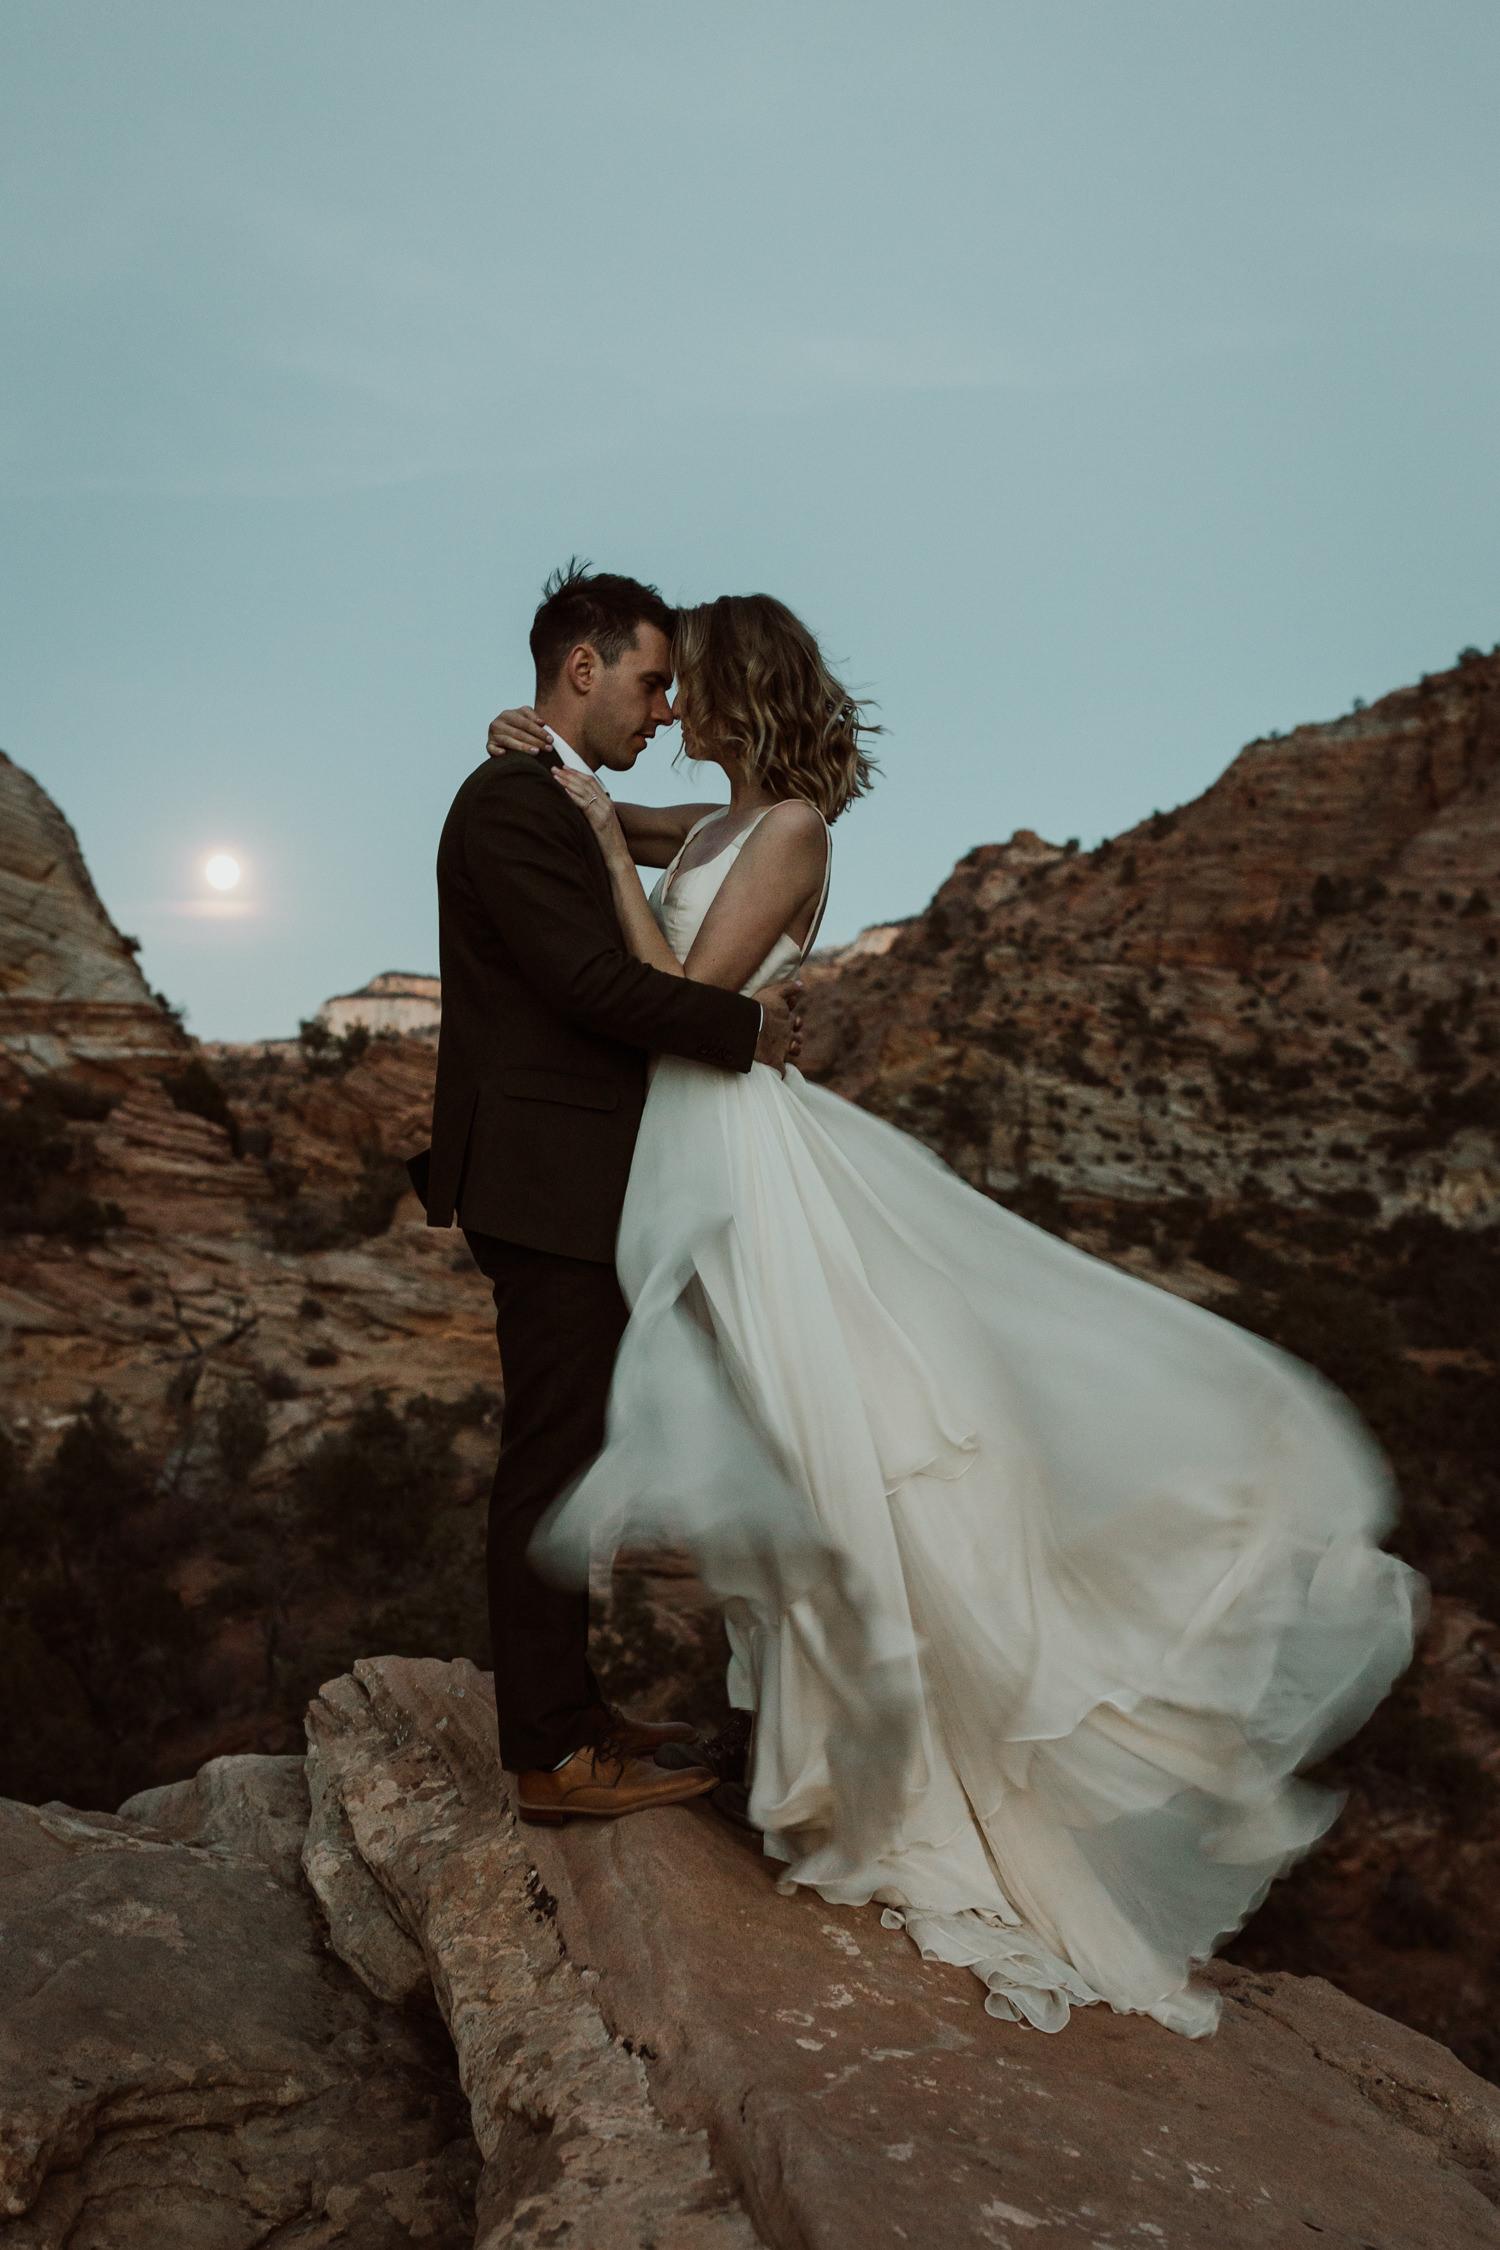 zion-national-park-wedding-143.jpg